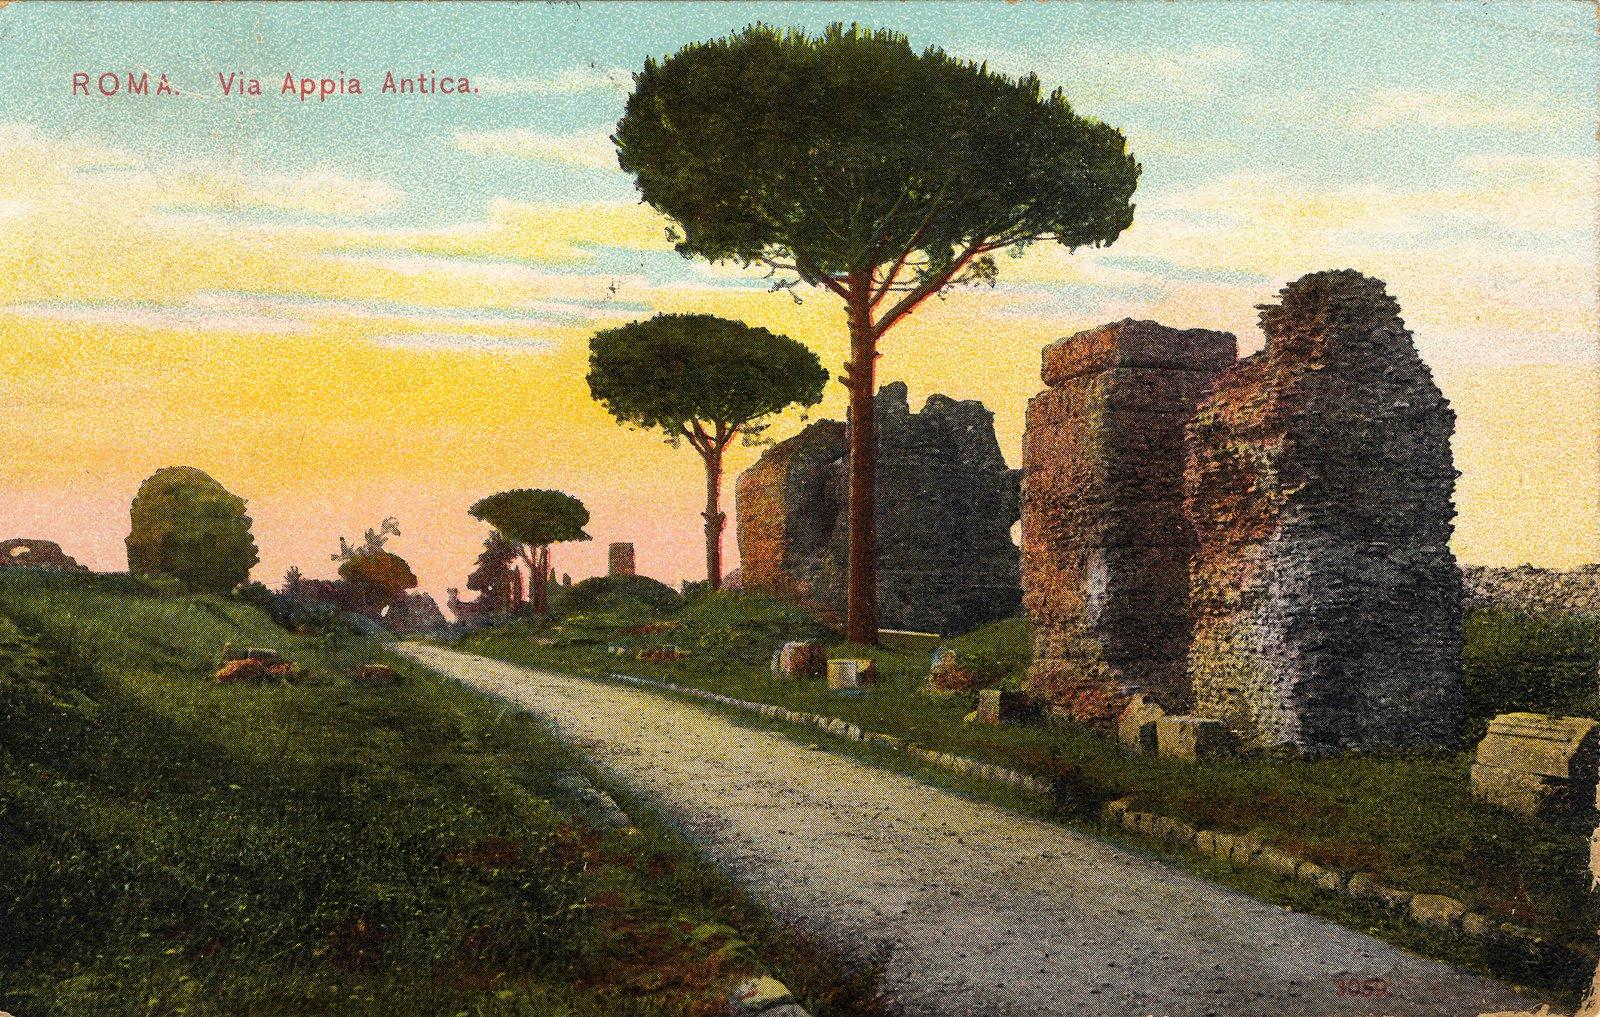 Full Image View: Roma. Via Appia Antica.: Halton Images